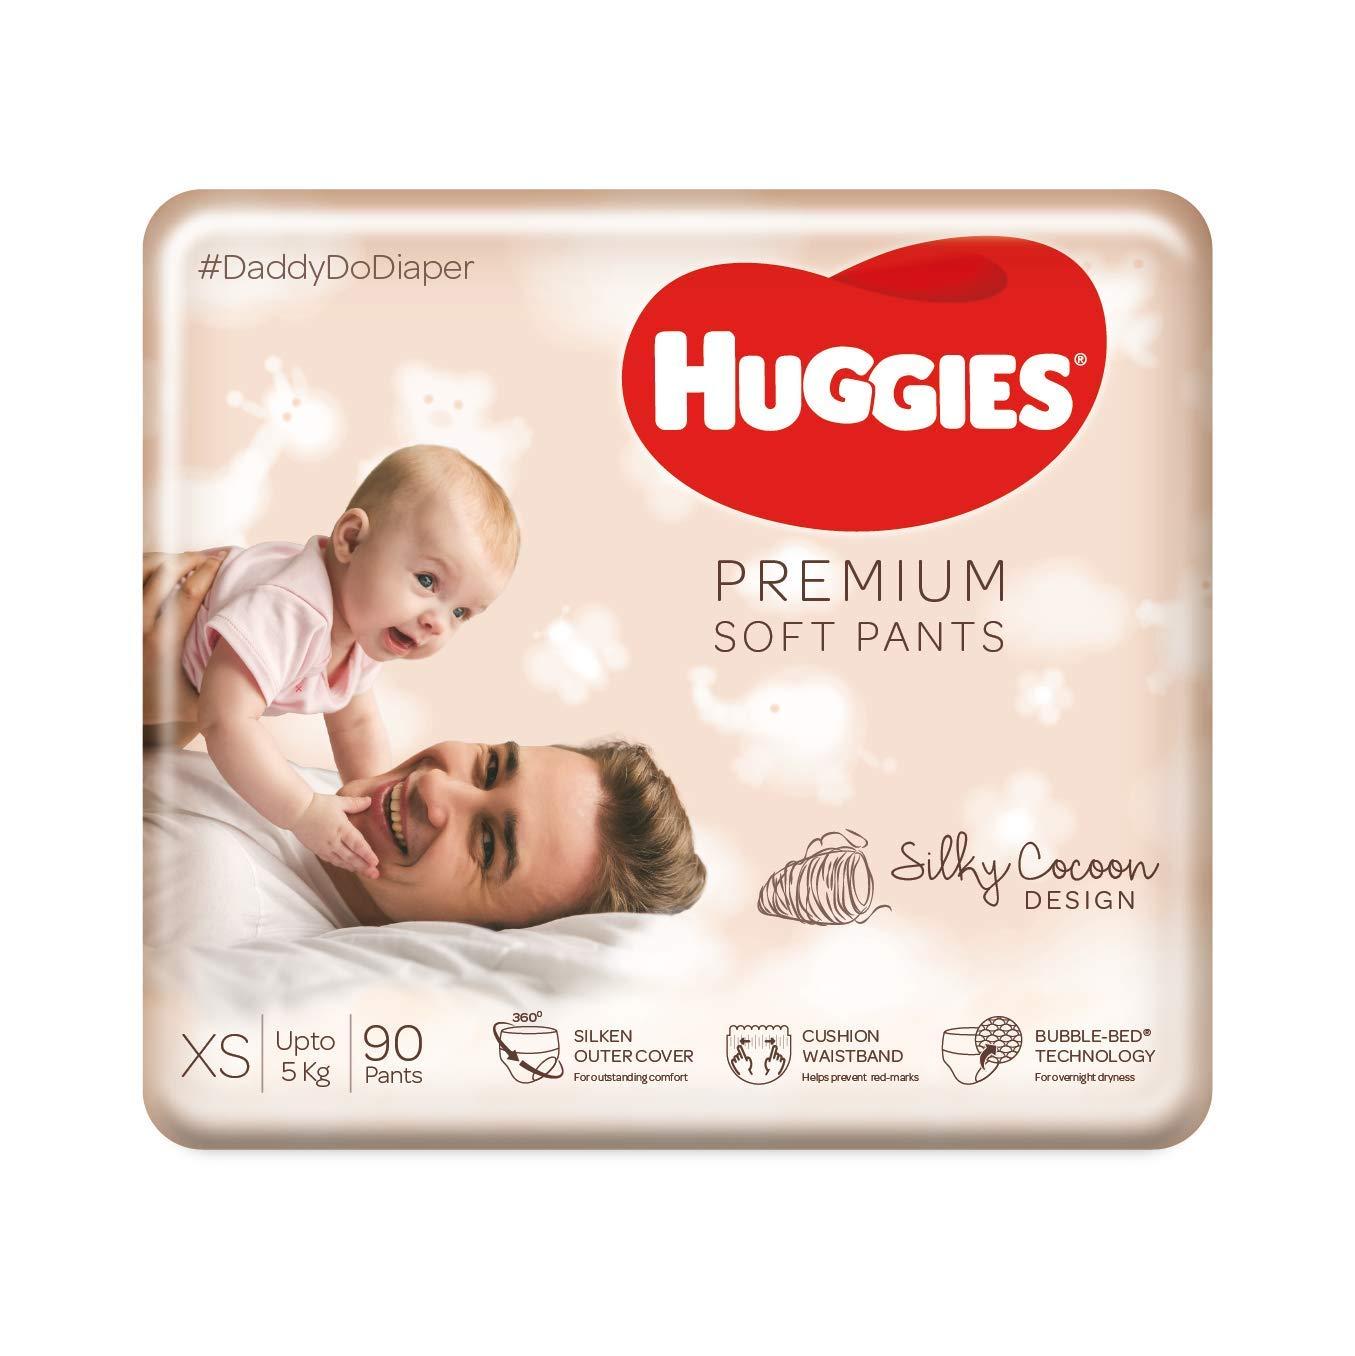 Huggies Premium Soft Pants, Extra Small / New Born (XS / NB) size newborn baby diaper pants, 90 count, Mom's No.1 choice for newborns*